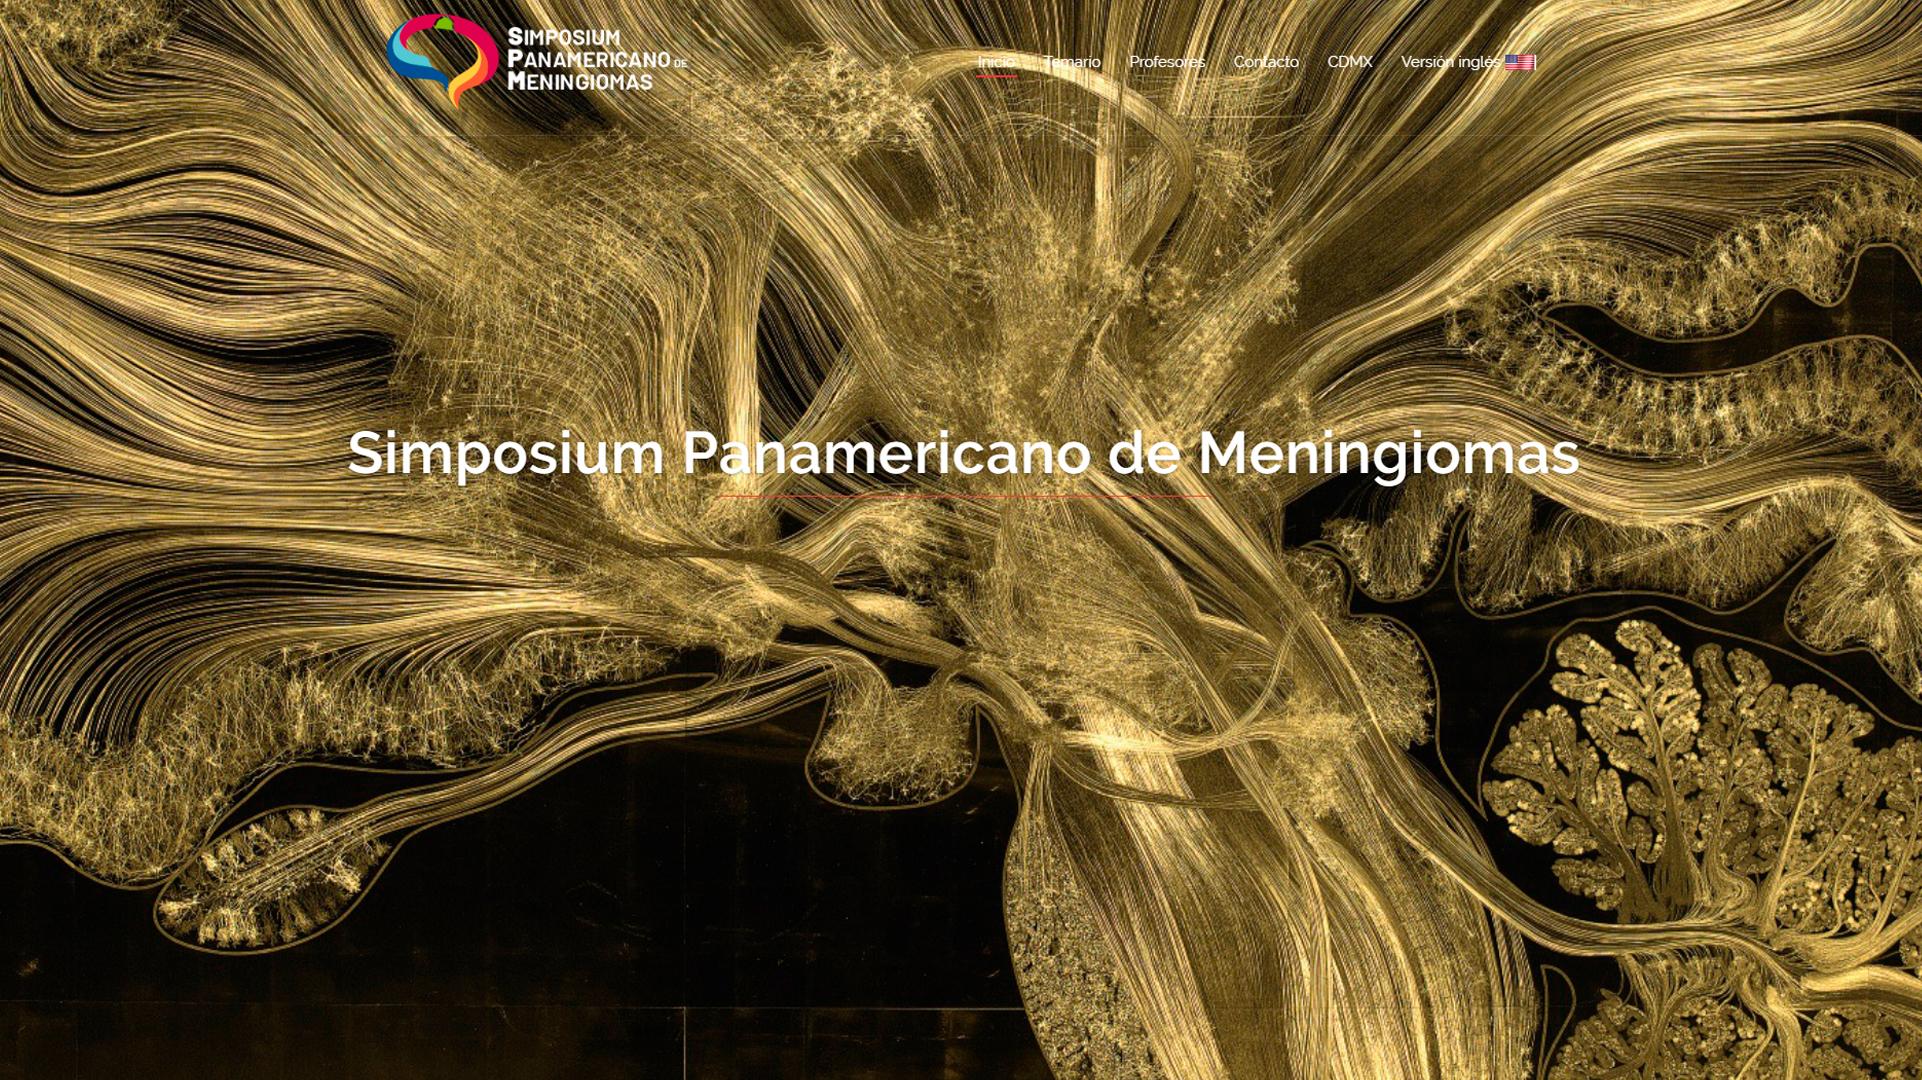 Simposium Panamericano de Meningiomas